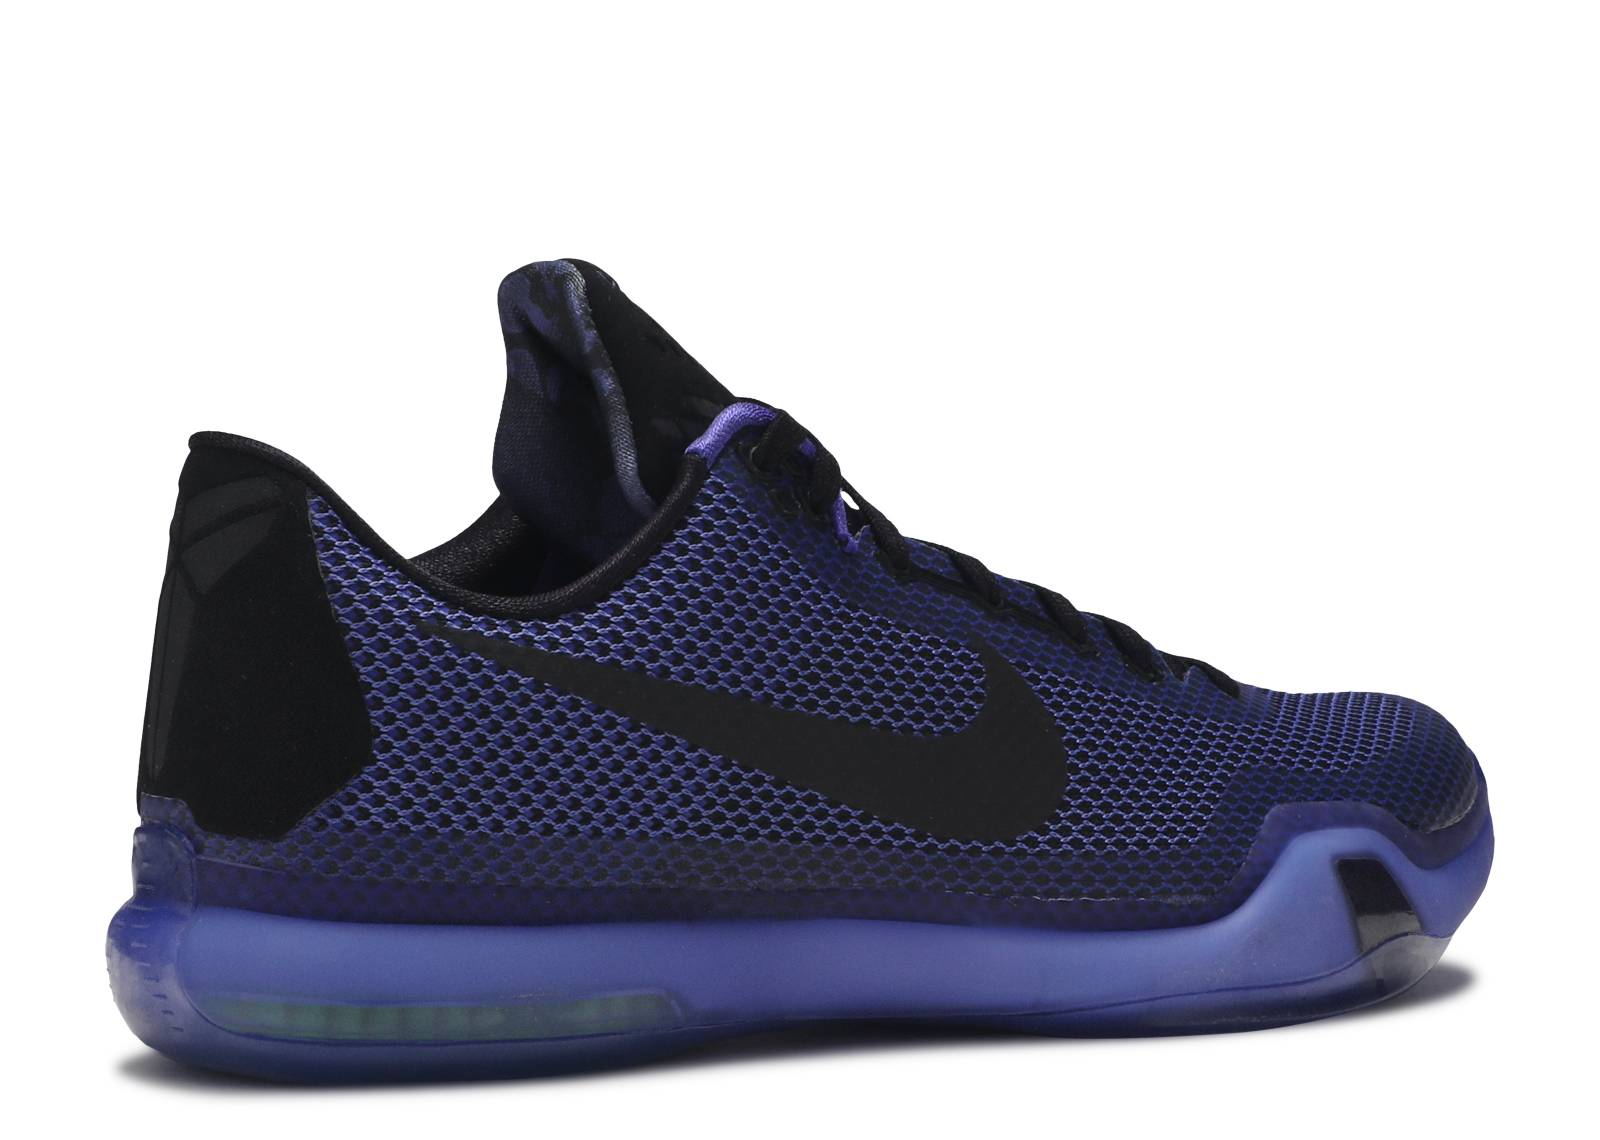 ... Nike Kobe X Elite Ignite High Top Ink/Persian Violet/Volt/; kobe 10 ...